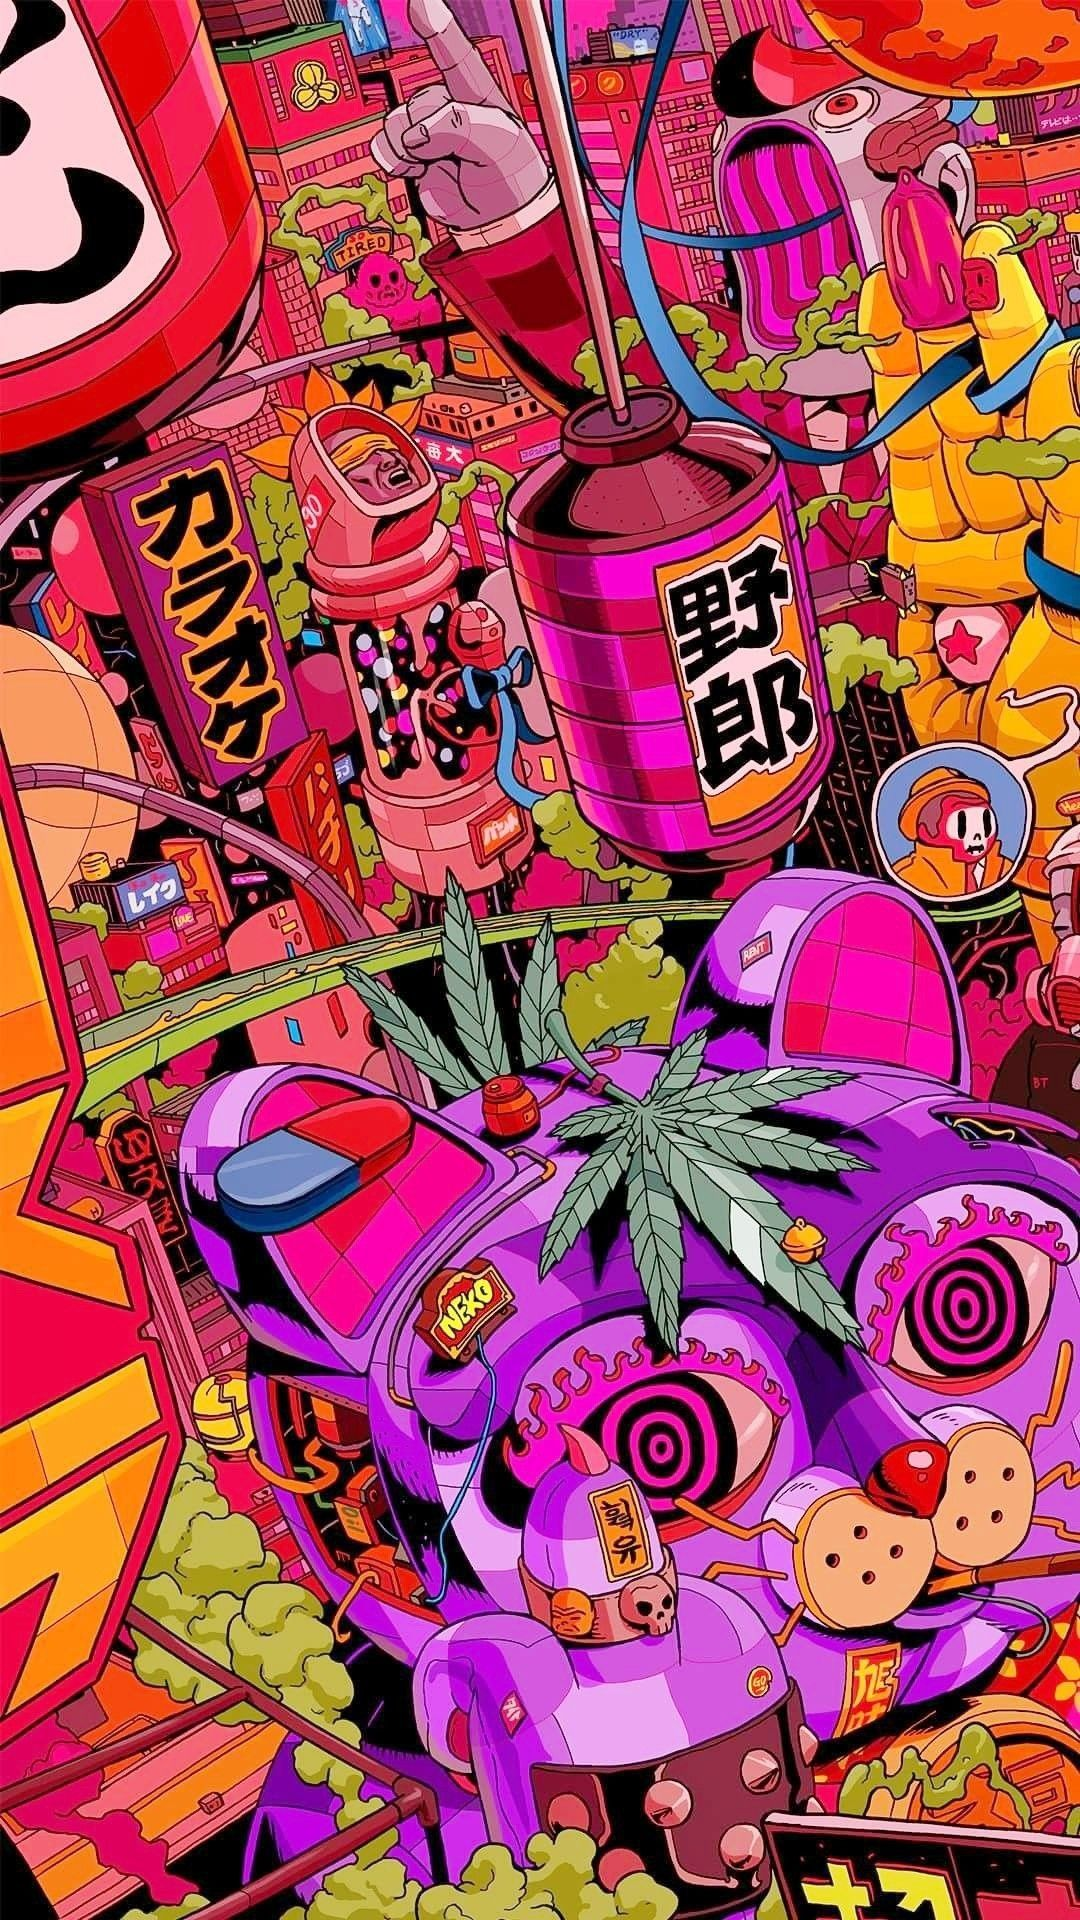 Trippy Stoner Wallpapers : trippy, stoner, wallpapers, Stoner, Trippy, Wallpaper, Android, Download, Hippie, Wallpaper,, Graffiti